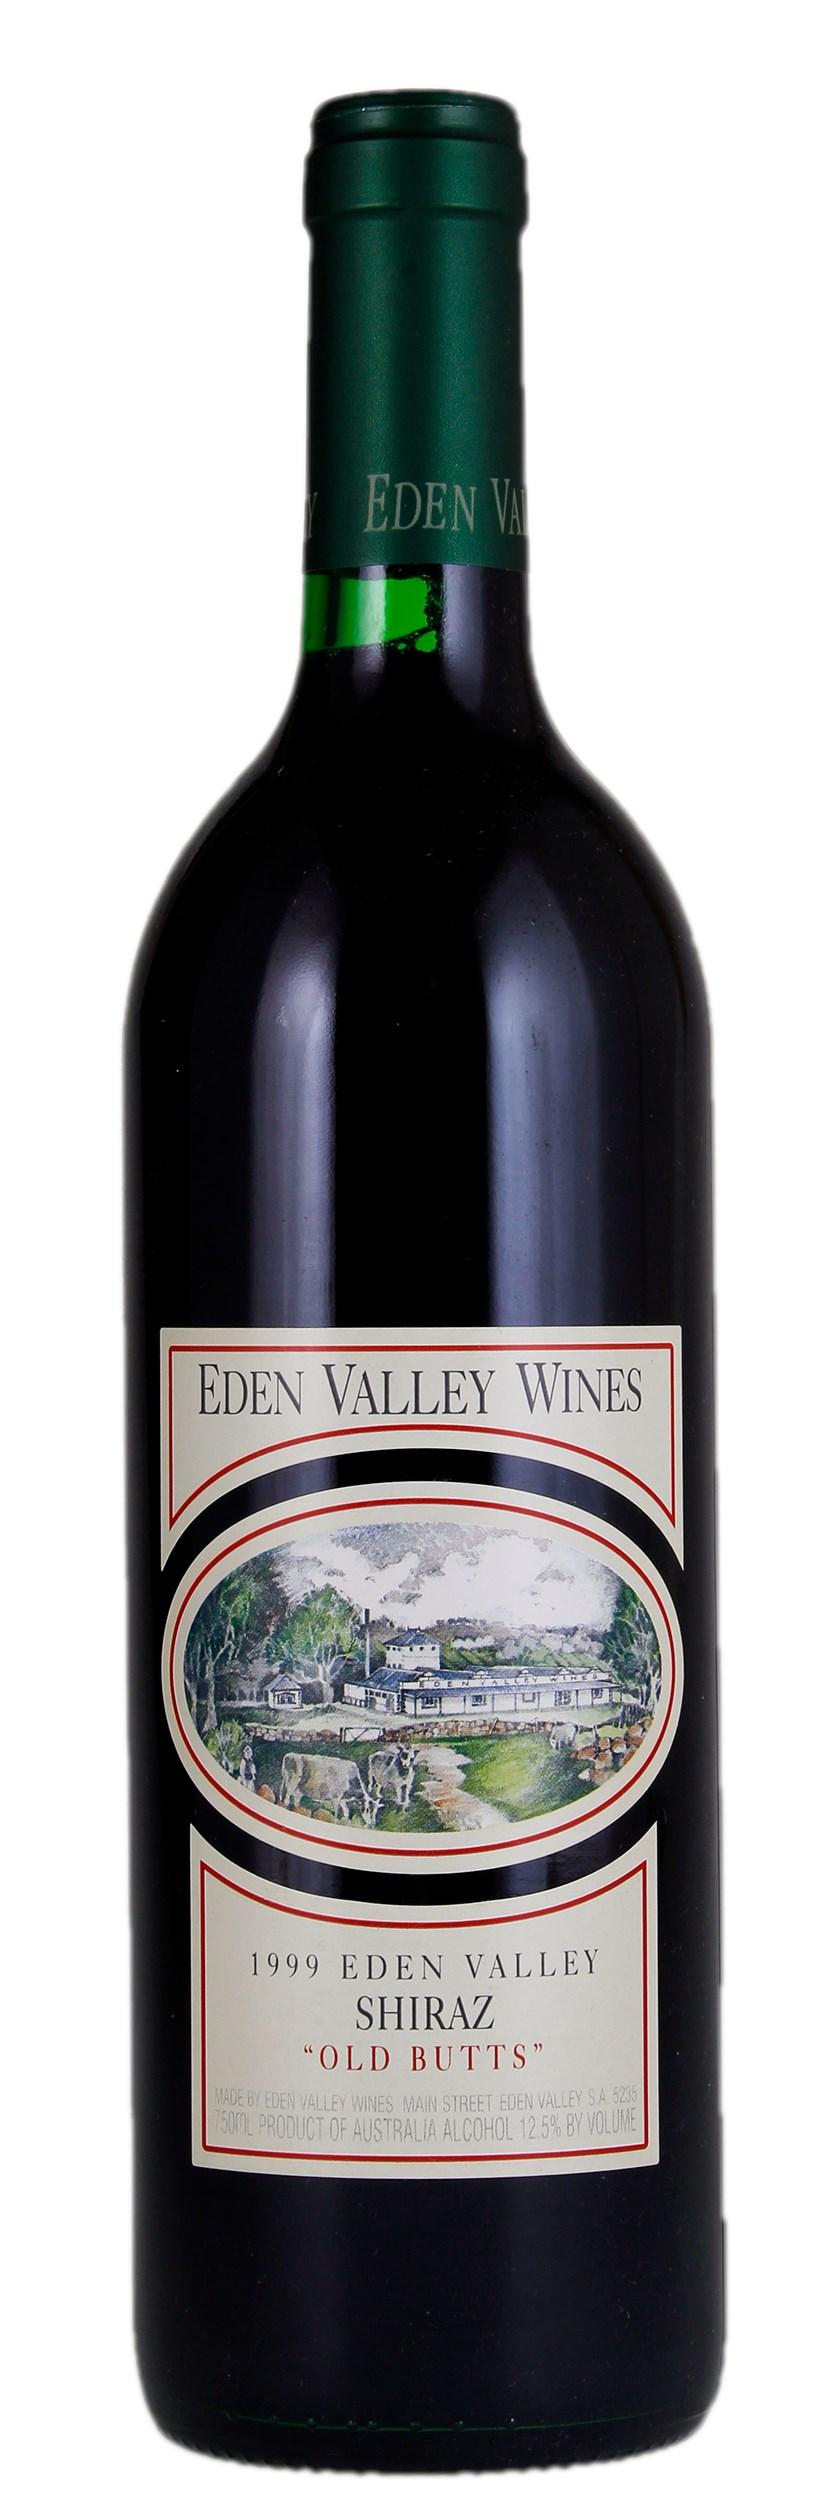 Eden Valley Old Butts Shiraz 1999, Red Wine from Australia | WineBid